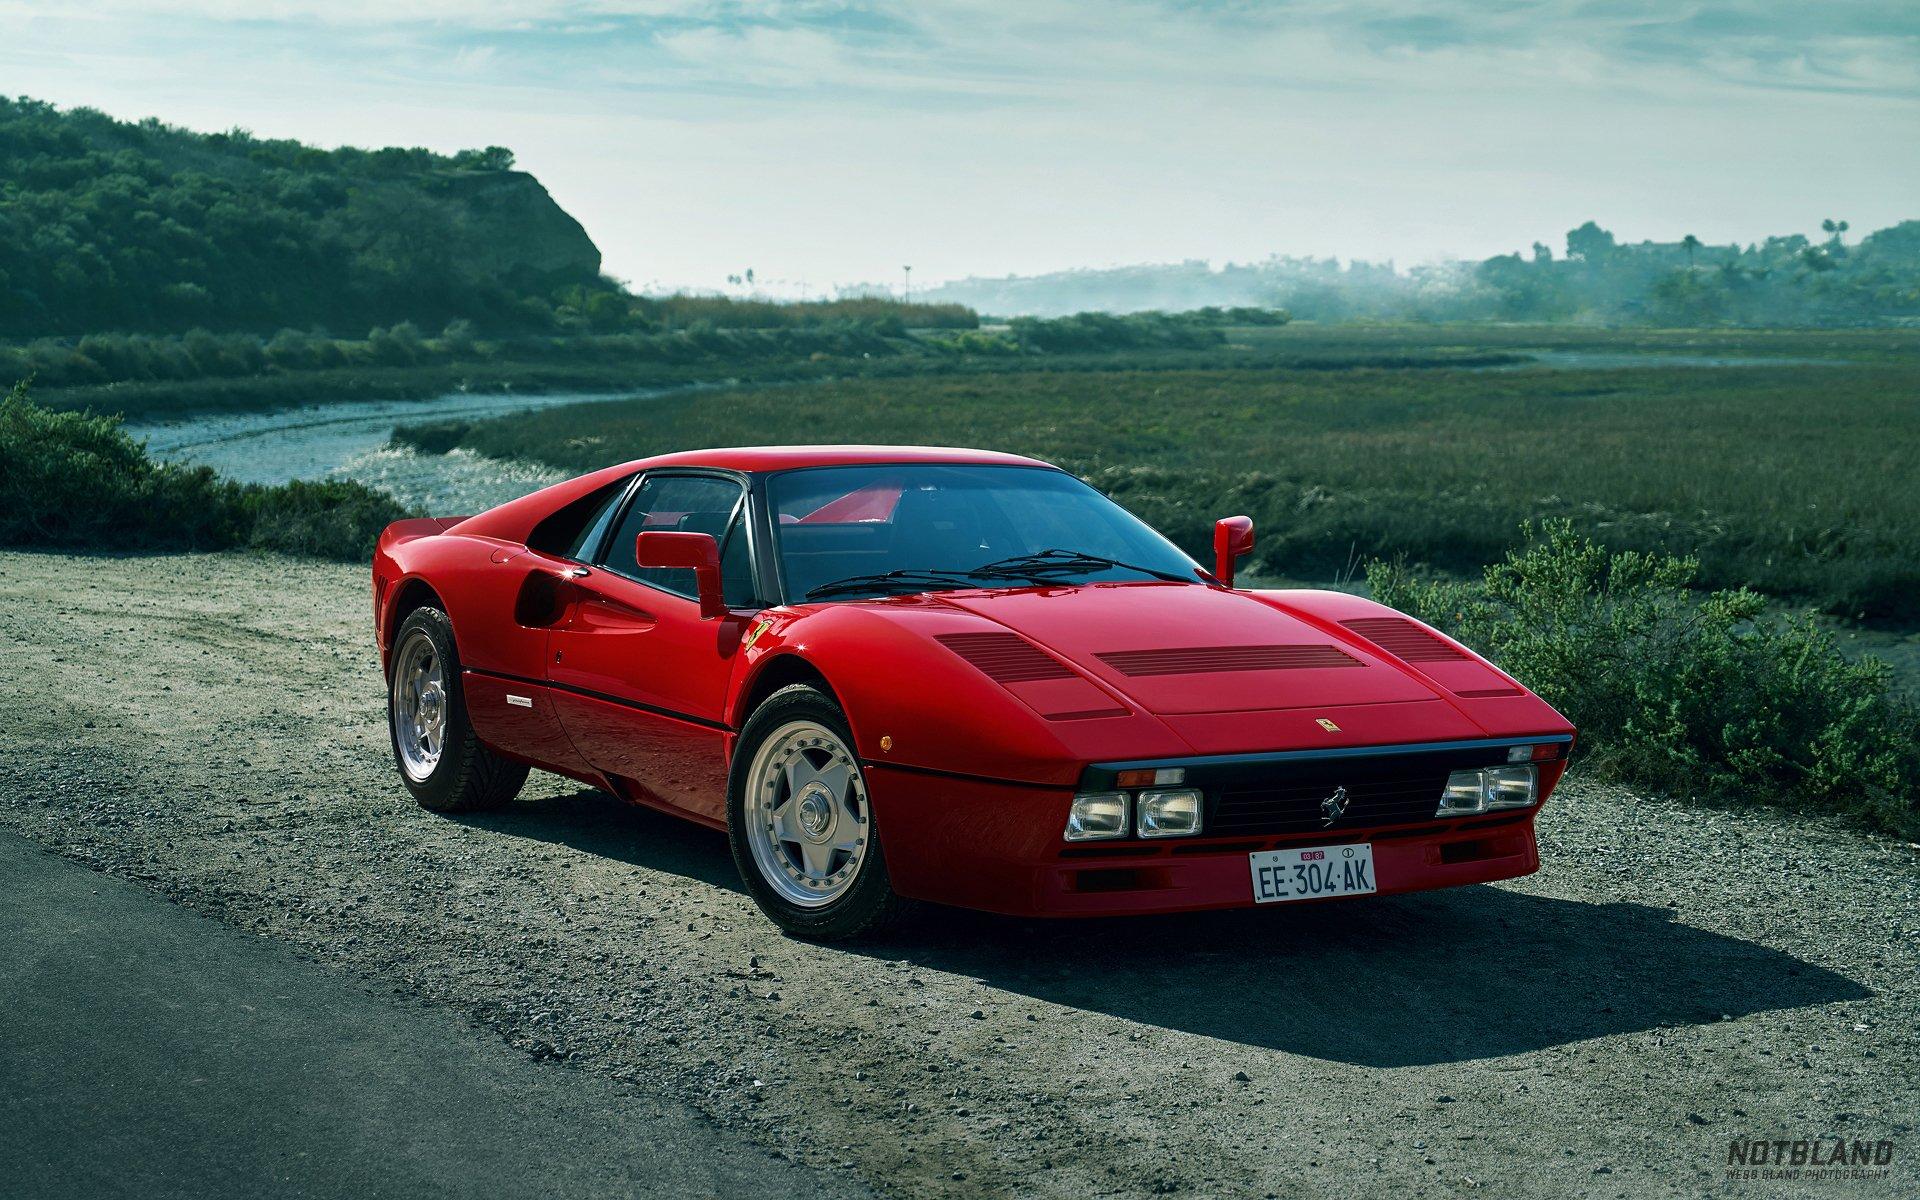 Ferrari 288 gto wallpaper